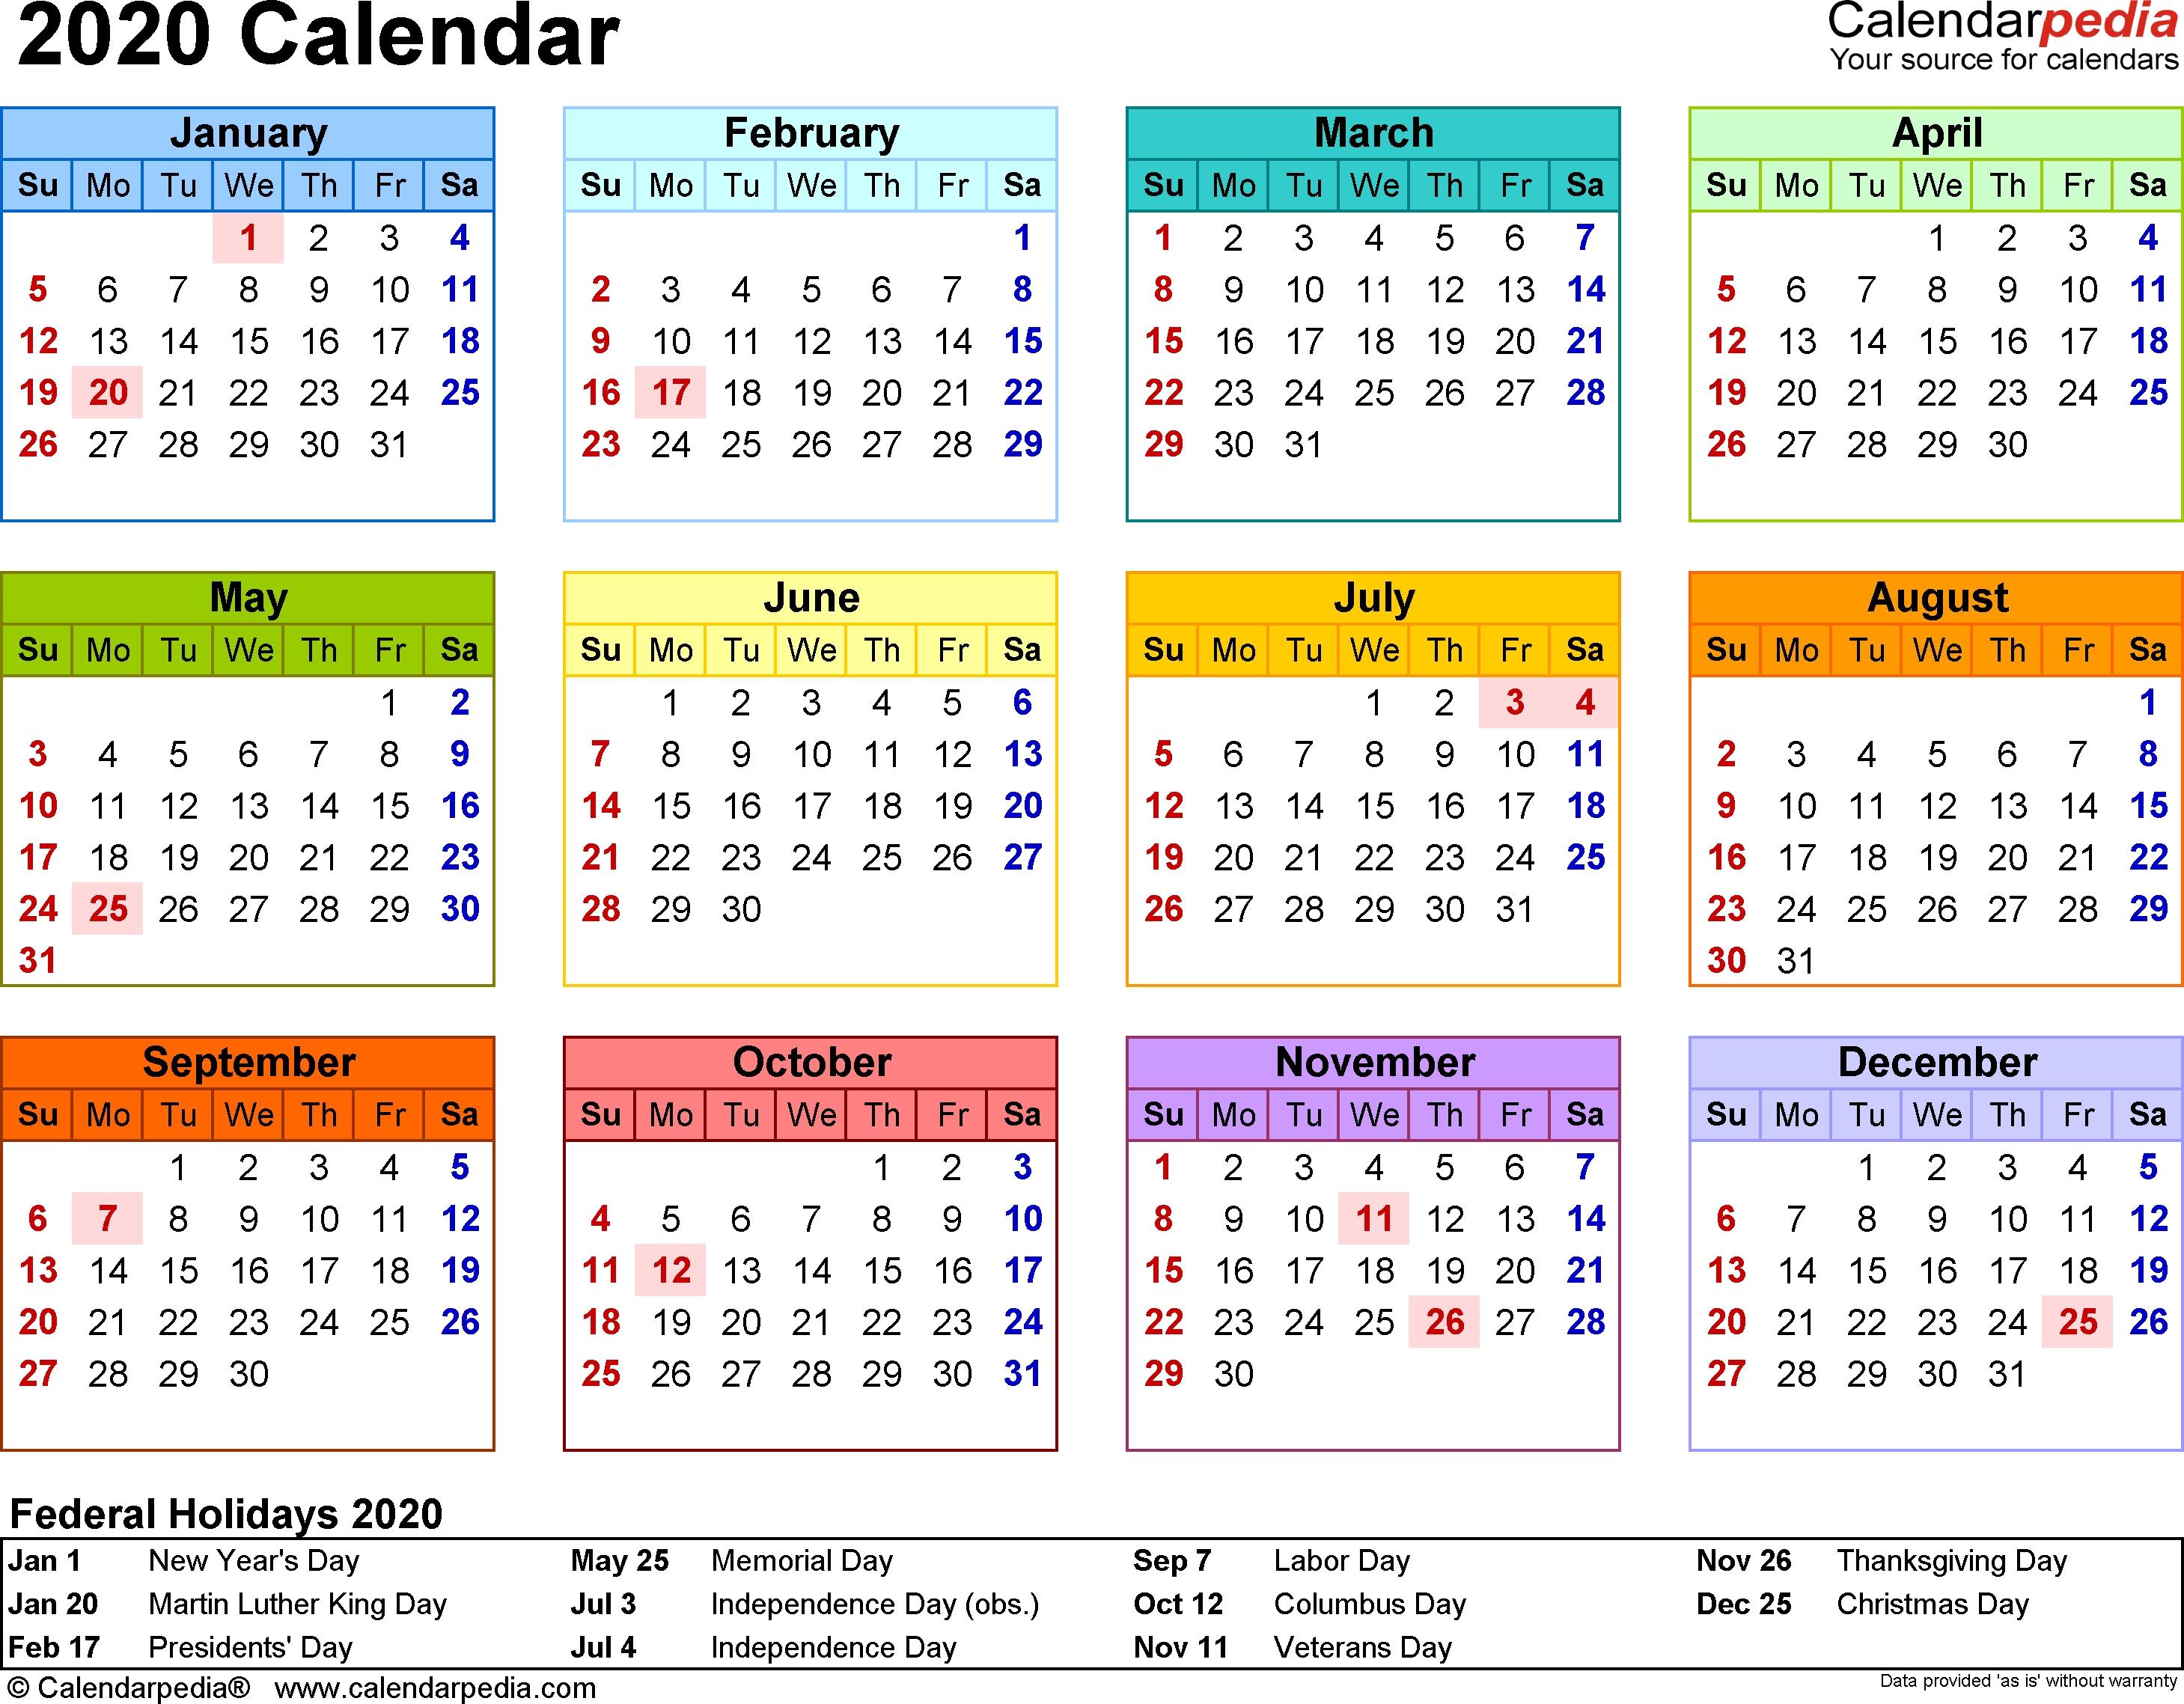 2020 Calendar - Download 18 Free Printable Excel Templates-6 Month Calendar Template 2020